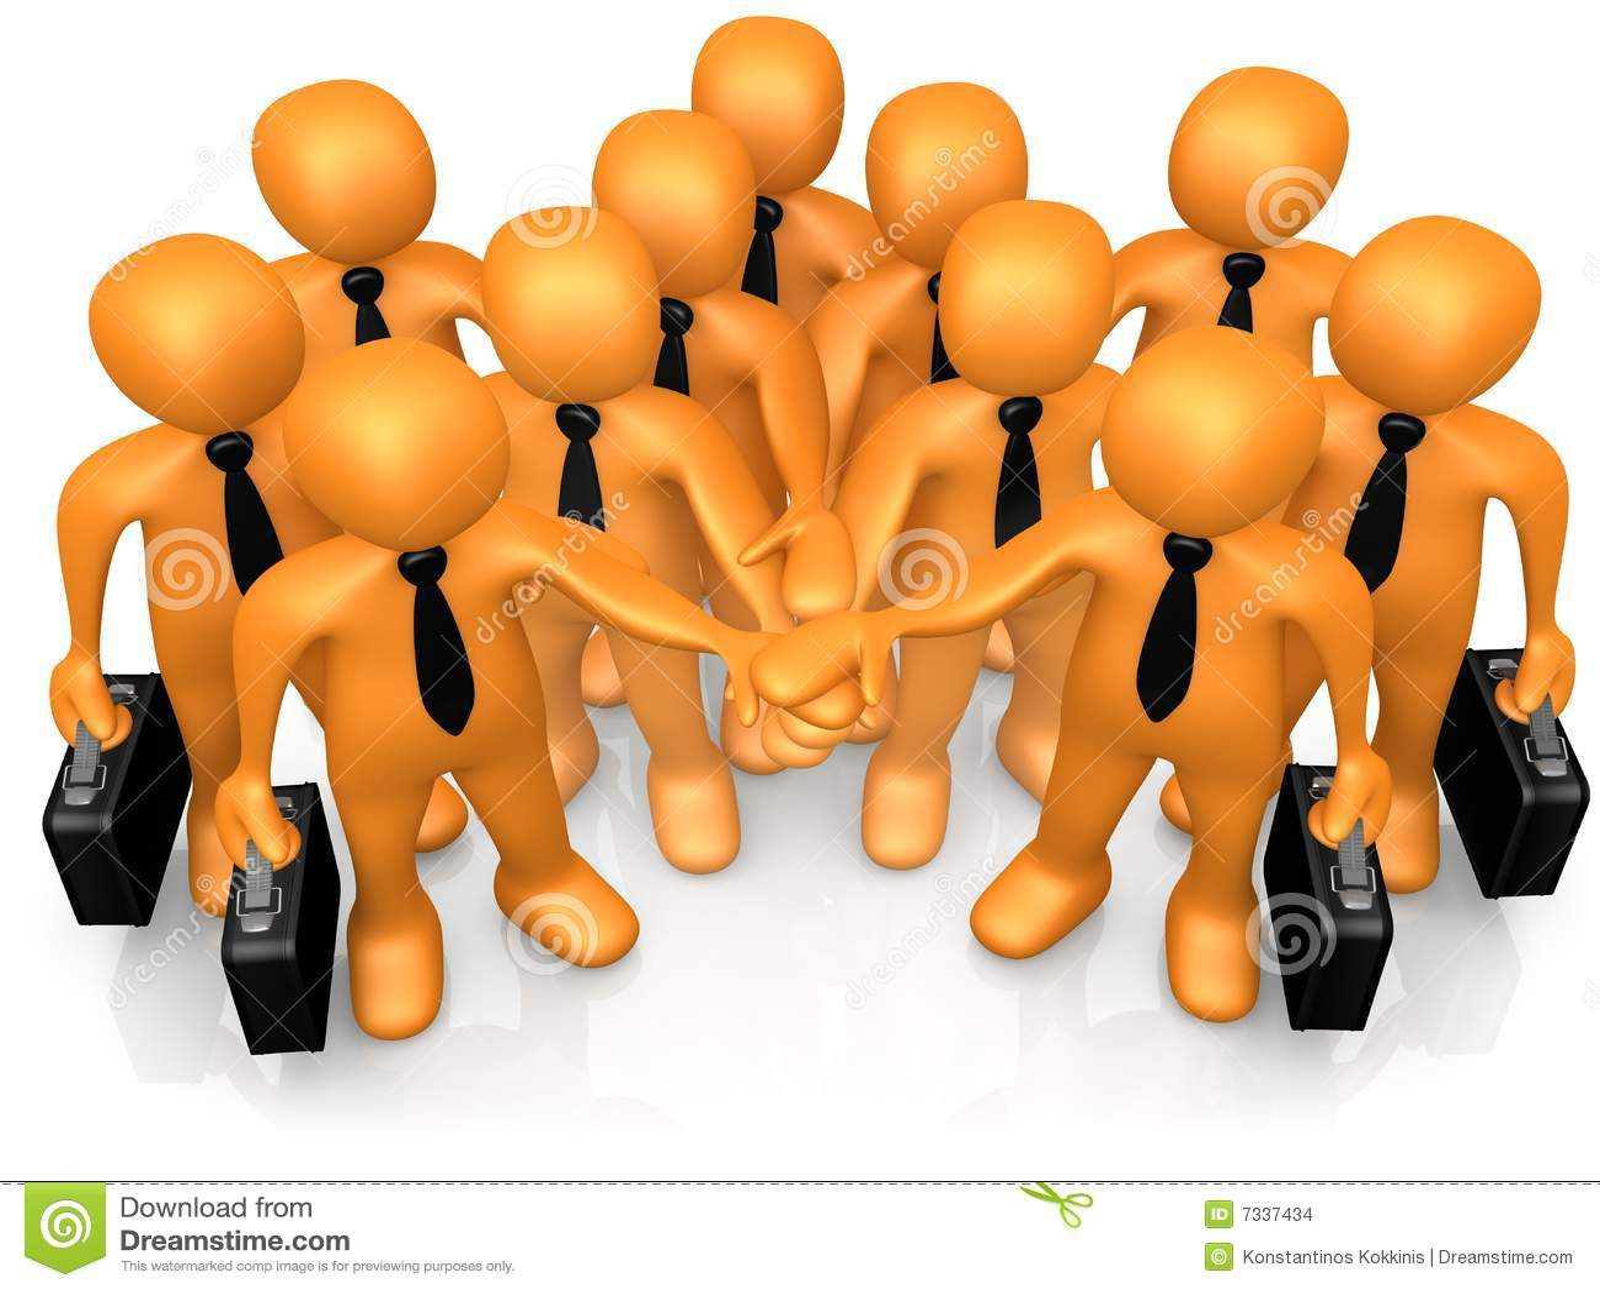 Teamwork stock illustration. Illustration of cooperation ...